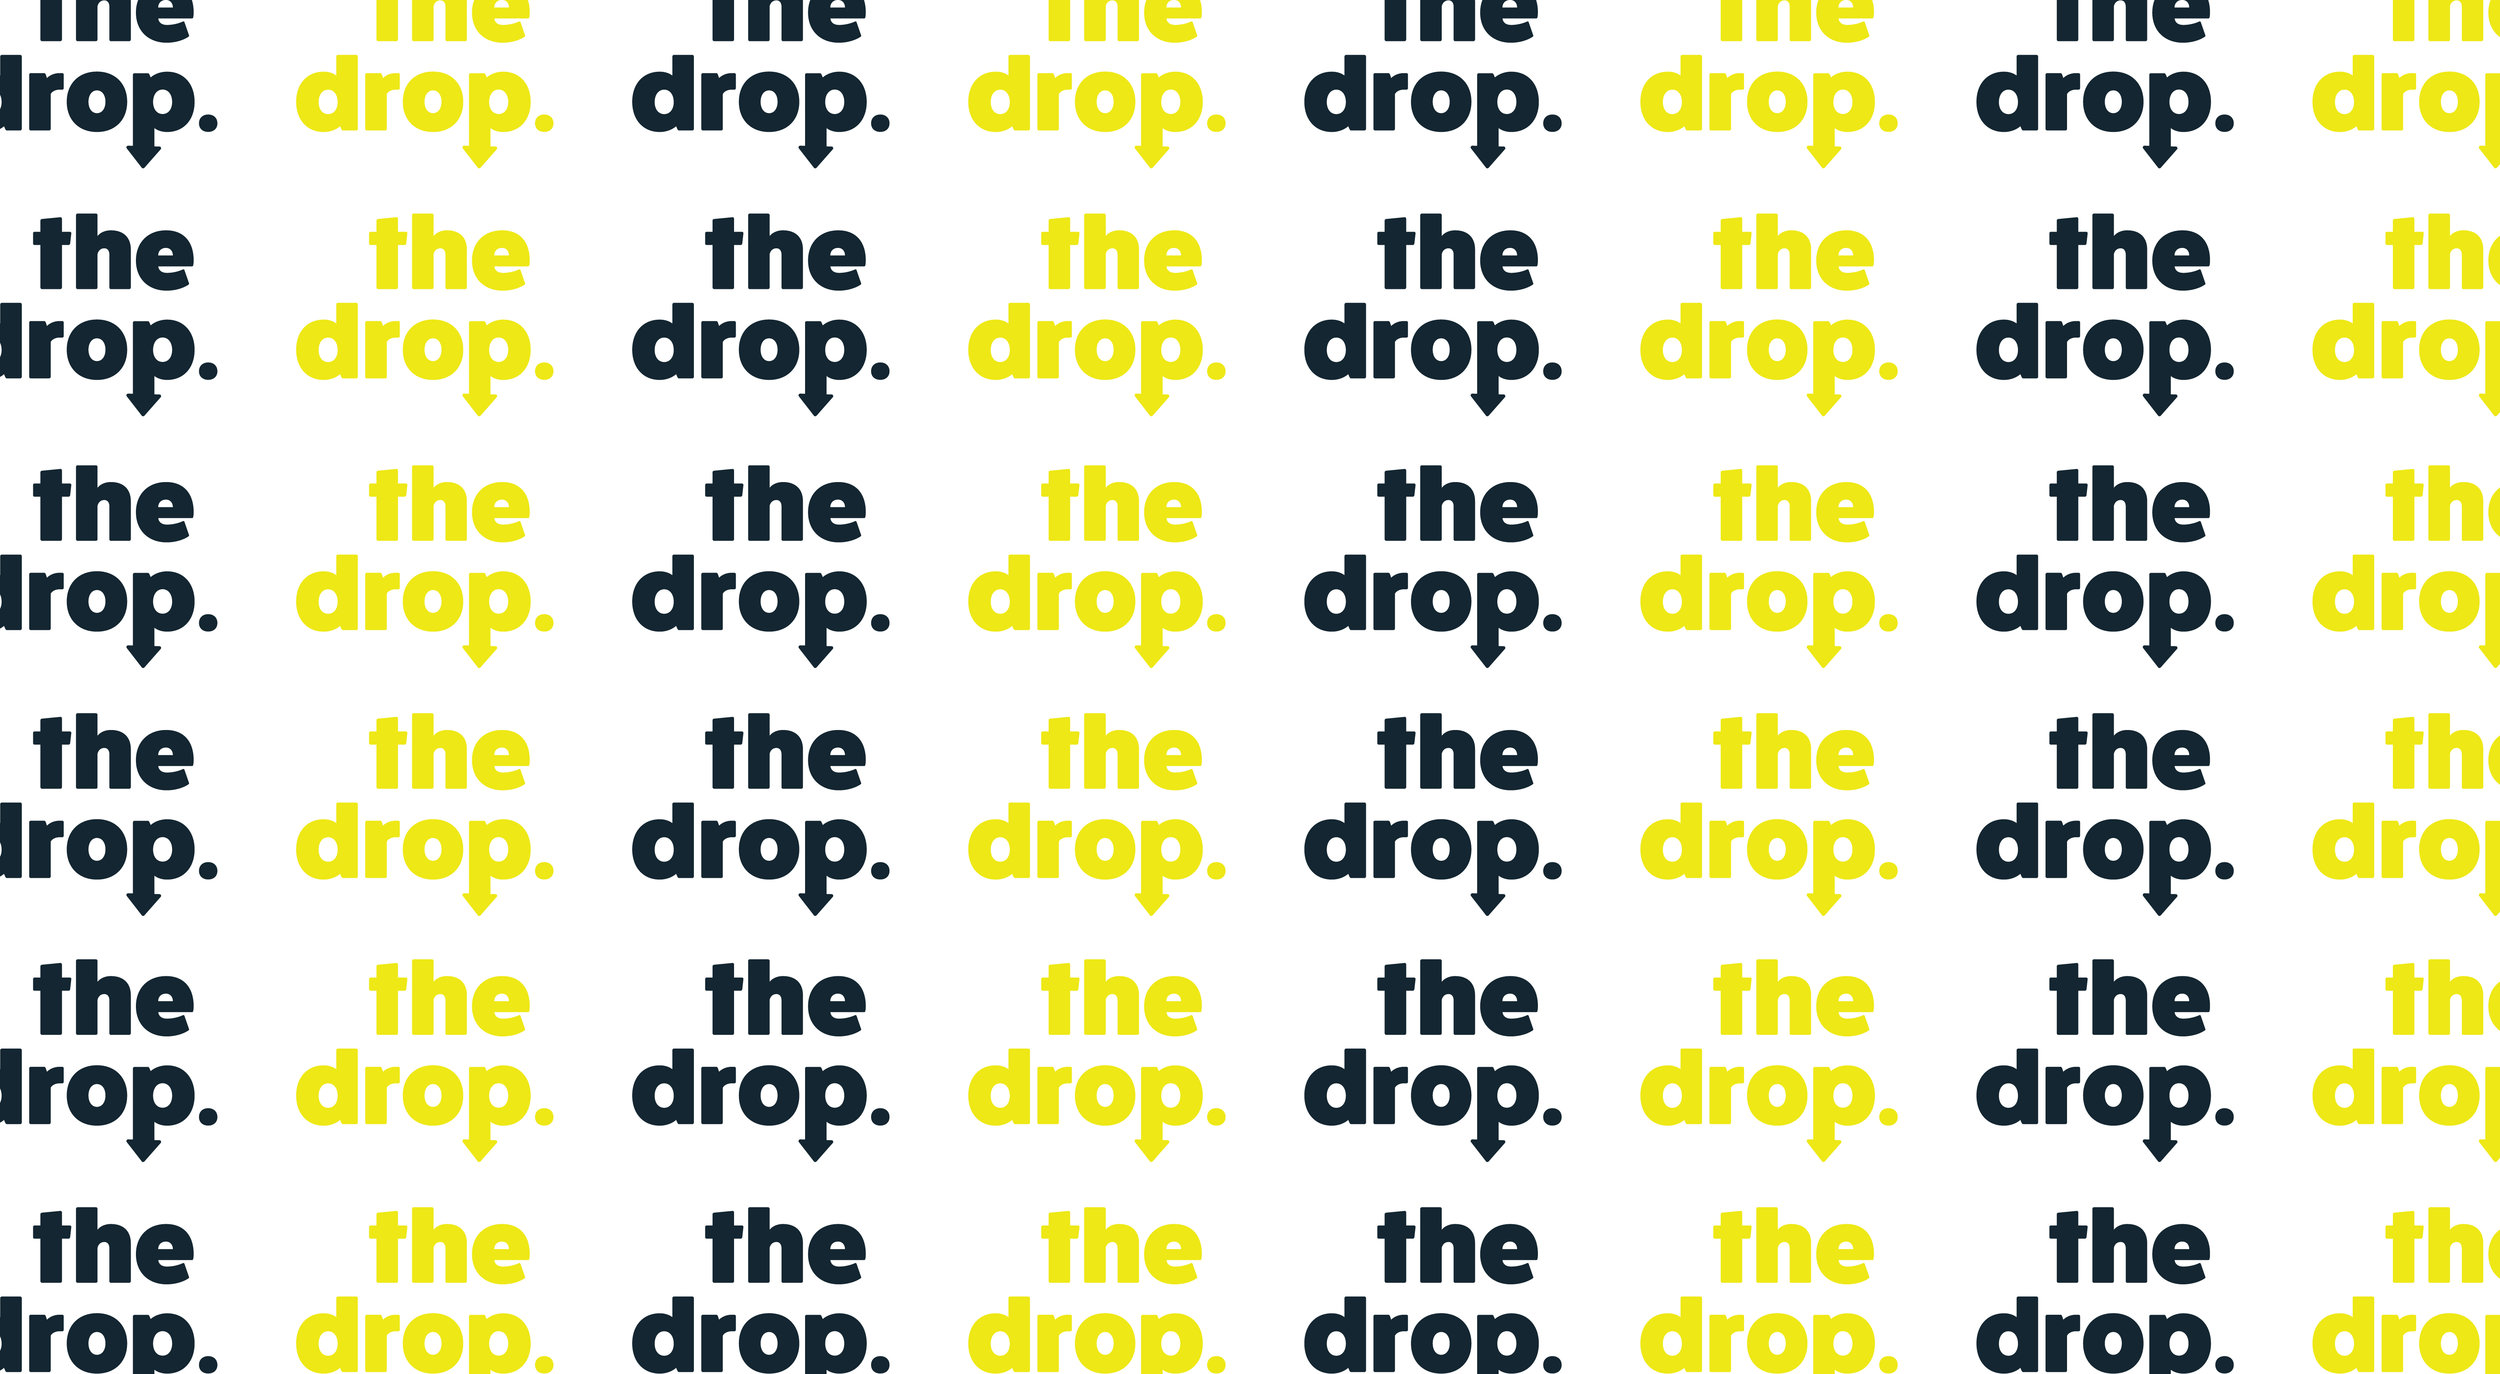 TheDrop_Logo-01.jpg